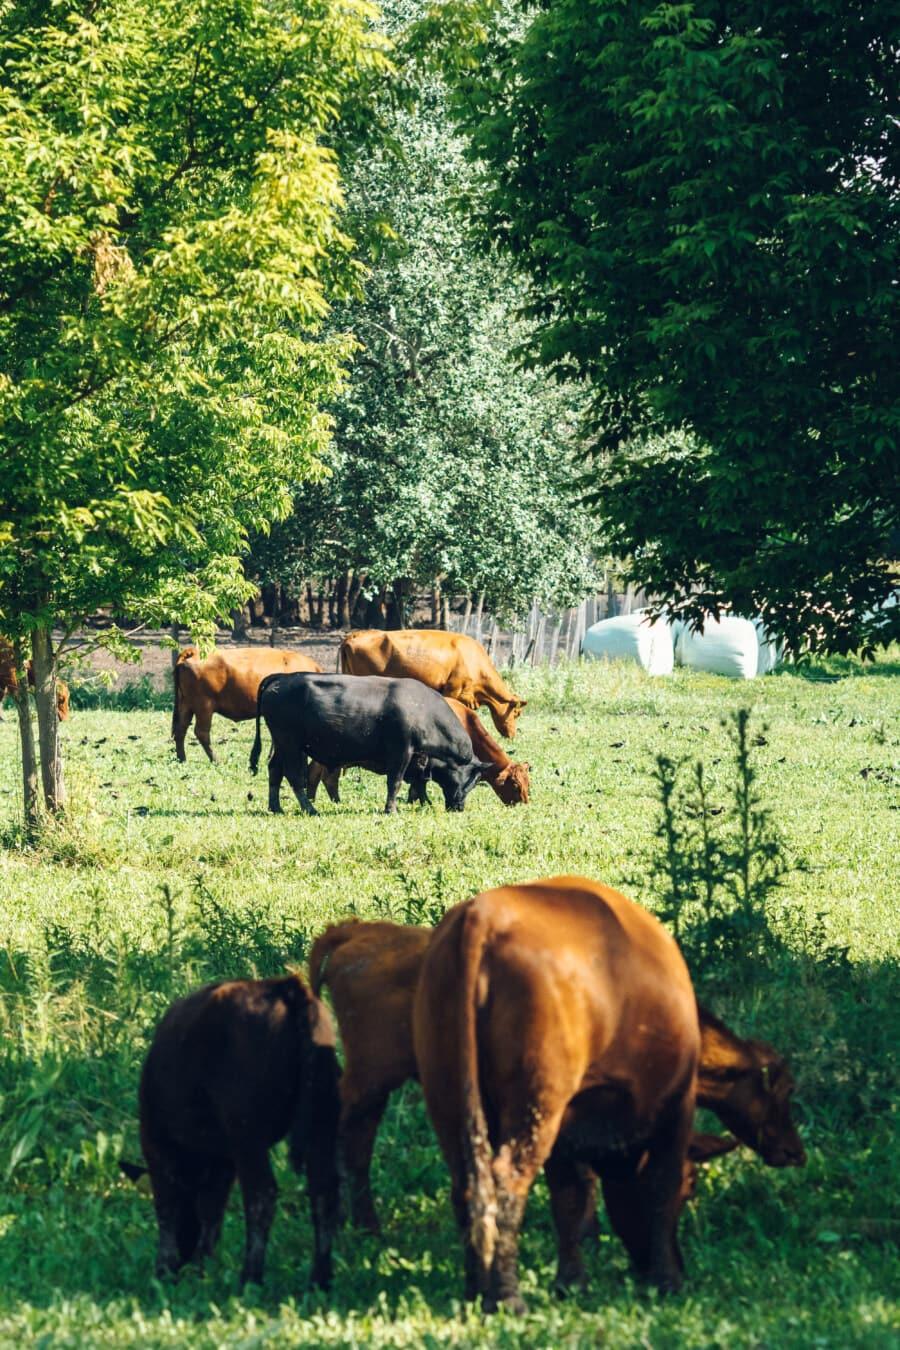 noir, Bull, animaux, vache, bétail, bovine, bovins, pâturage, rural, Ranch